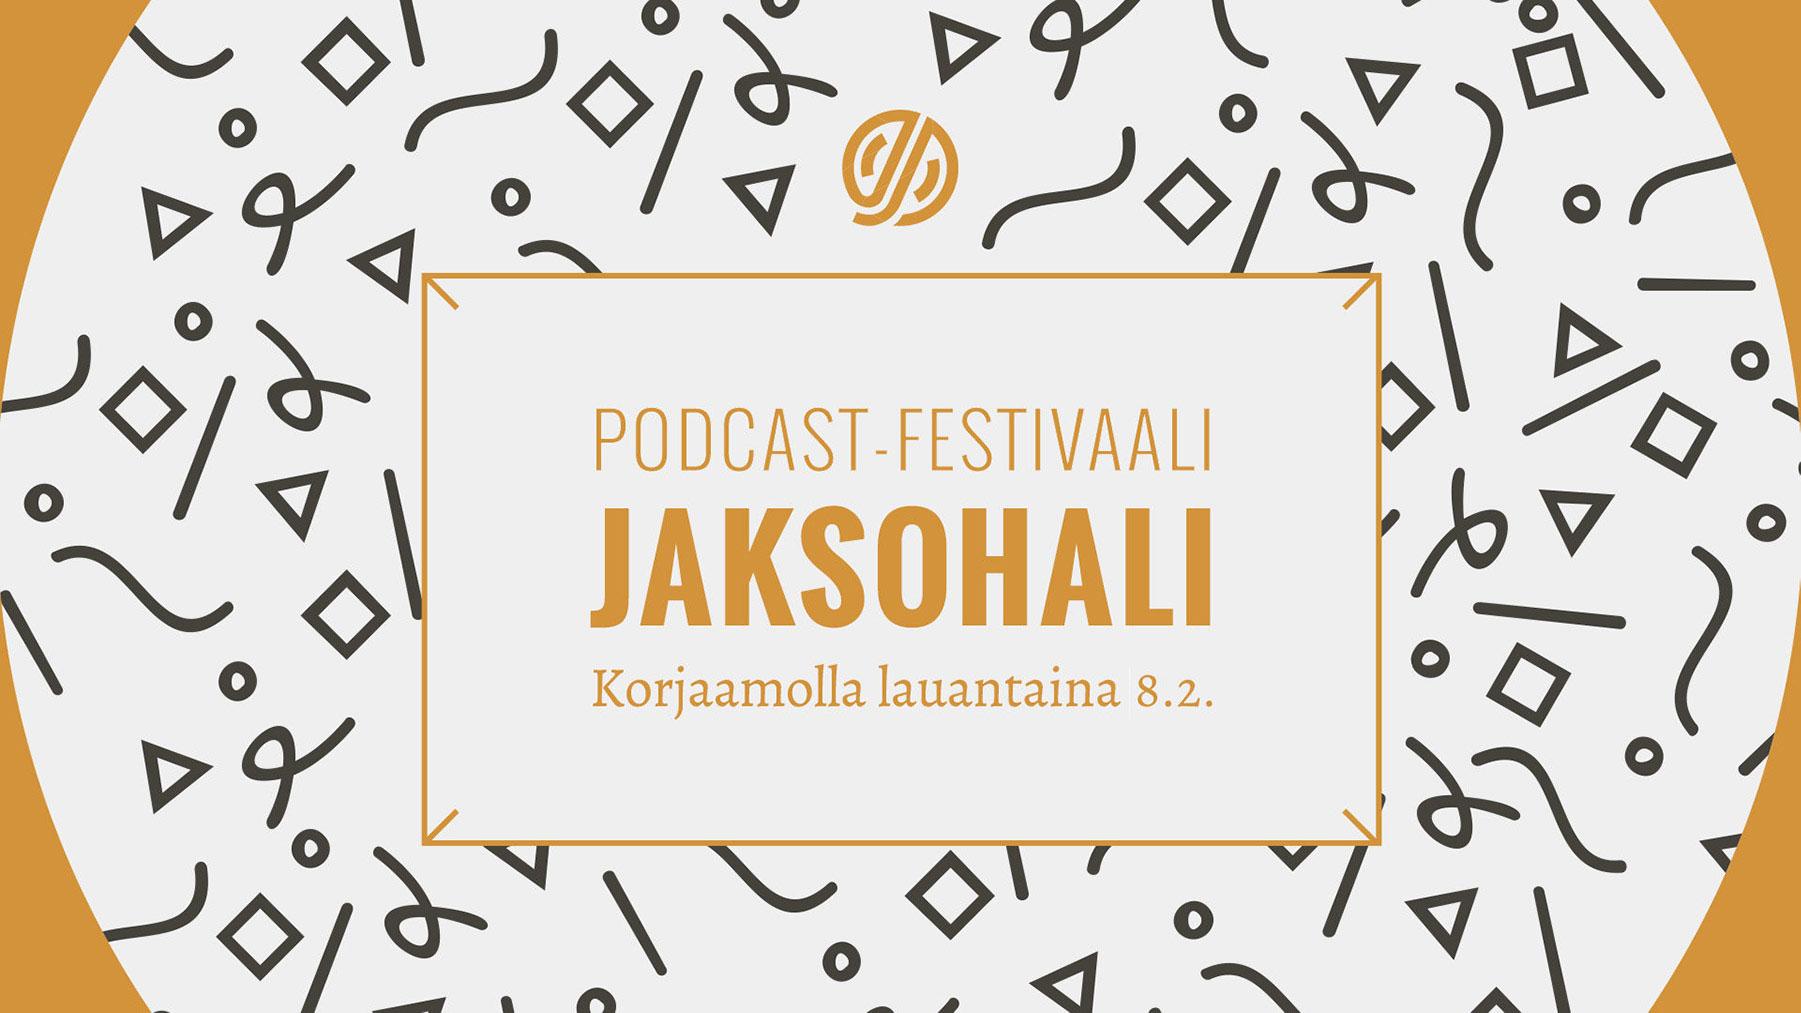 Link to event Jaksohali Podcast Festival